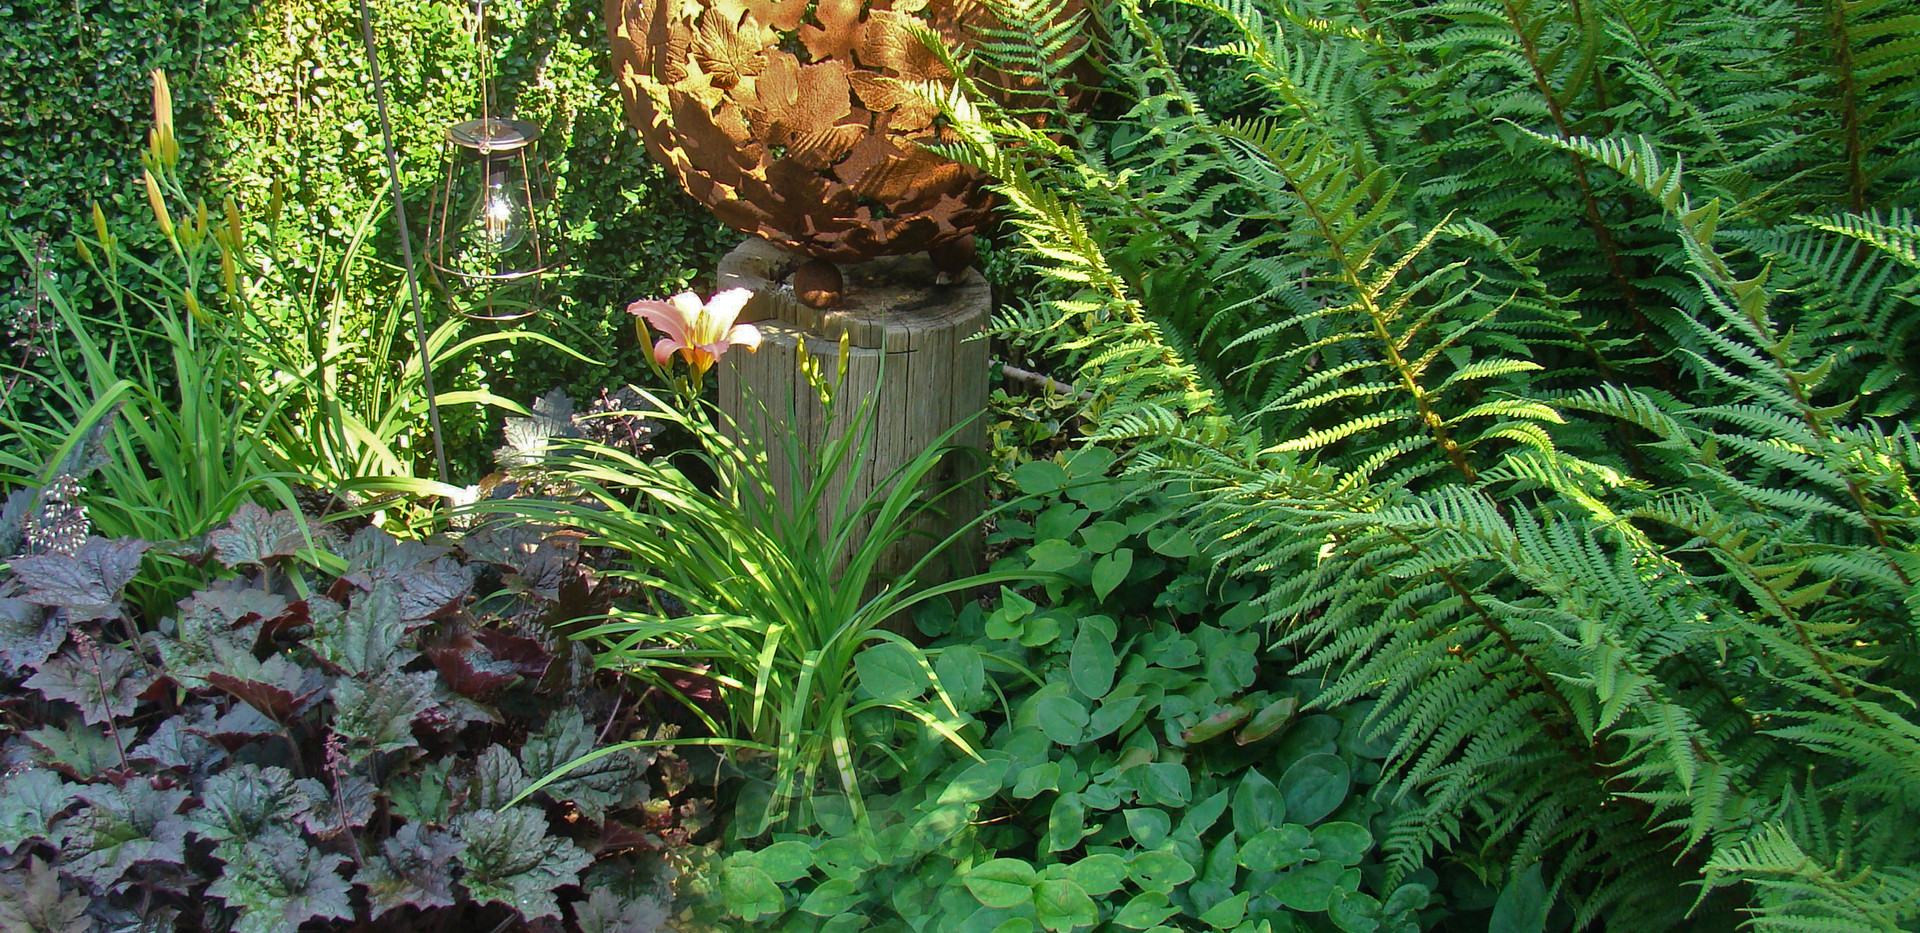 combining sculpture & planting